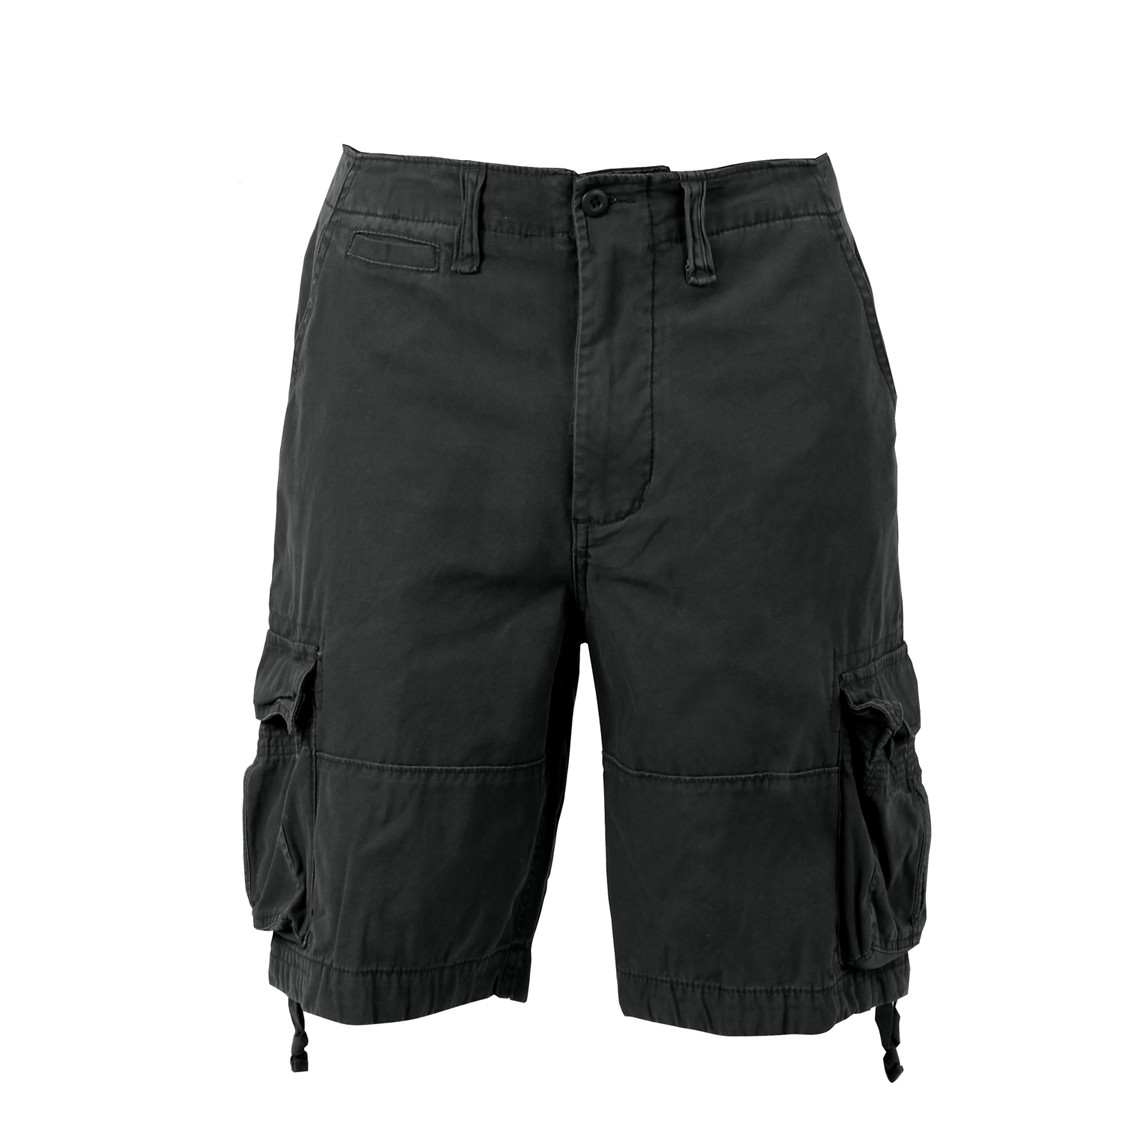 542b694dc1 Shop Vintage Black Infantry Utility Shorts - Fatigues Army Navy Gear